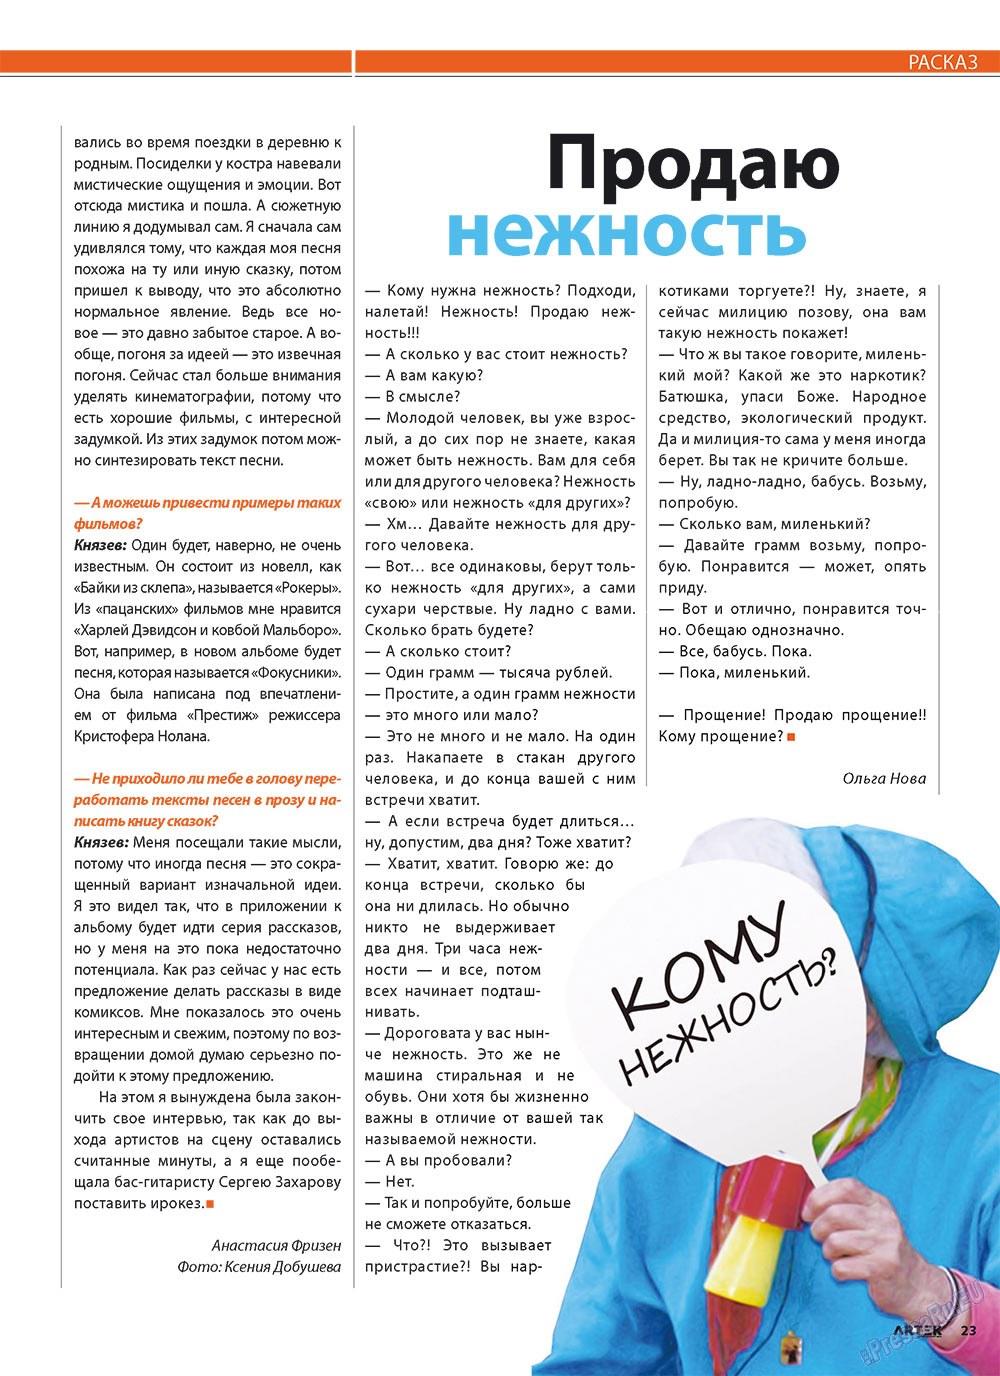 Артек (журнал). 2010 год, номер 2, стр. 25